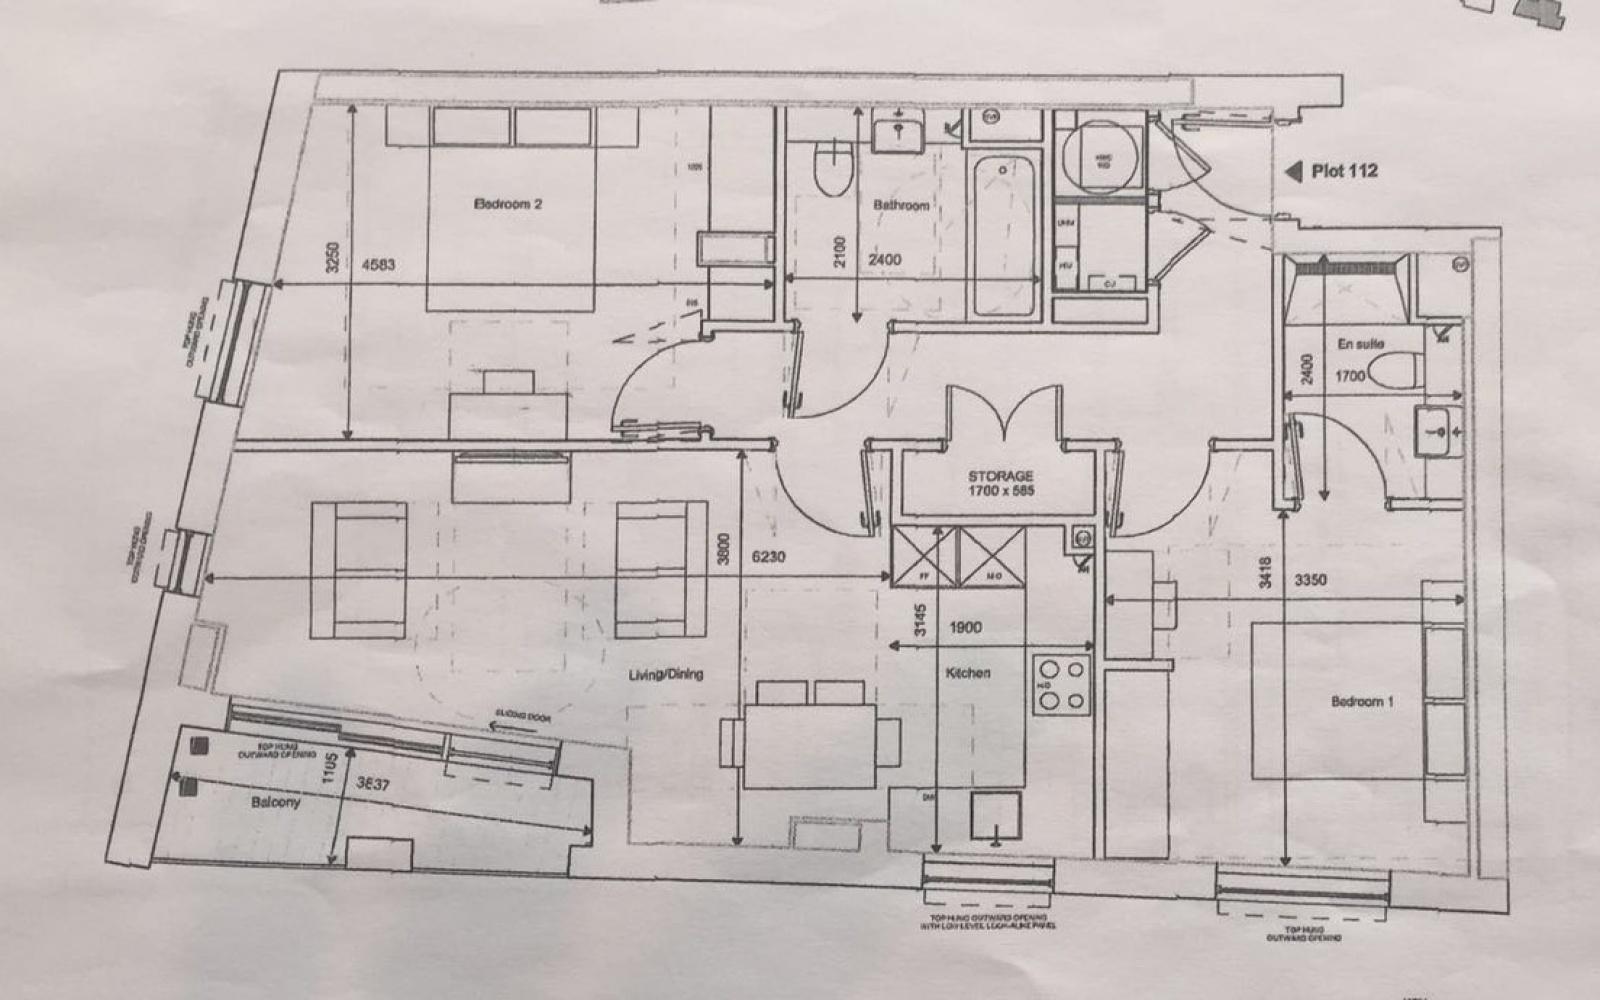 2 Bedrooms, Flat, For Sale, Wandsworth Road, 2 Bathrooms, Listing ID 1039, United Kingdom, Nine Elms,